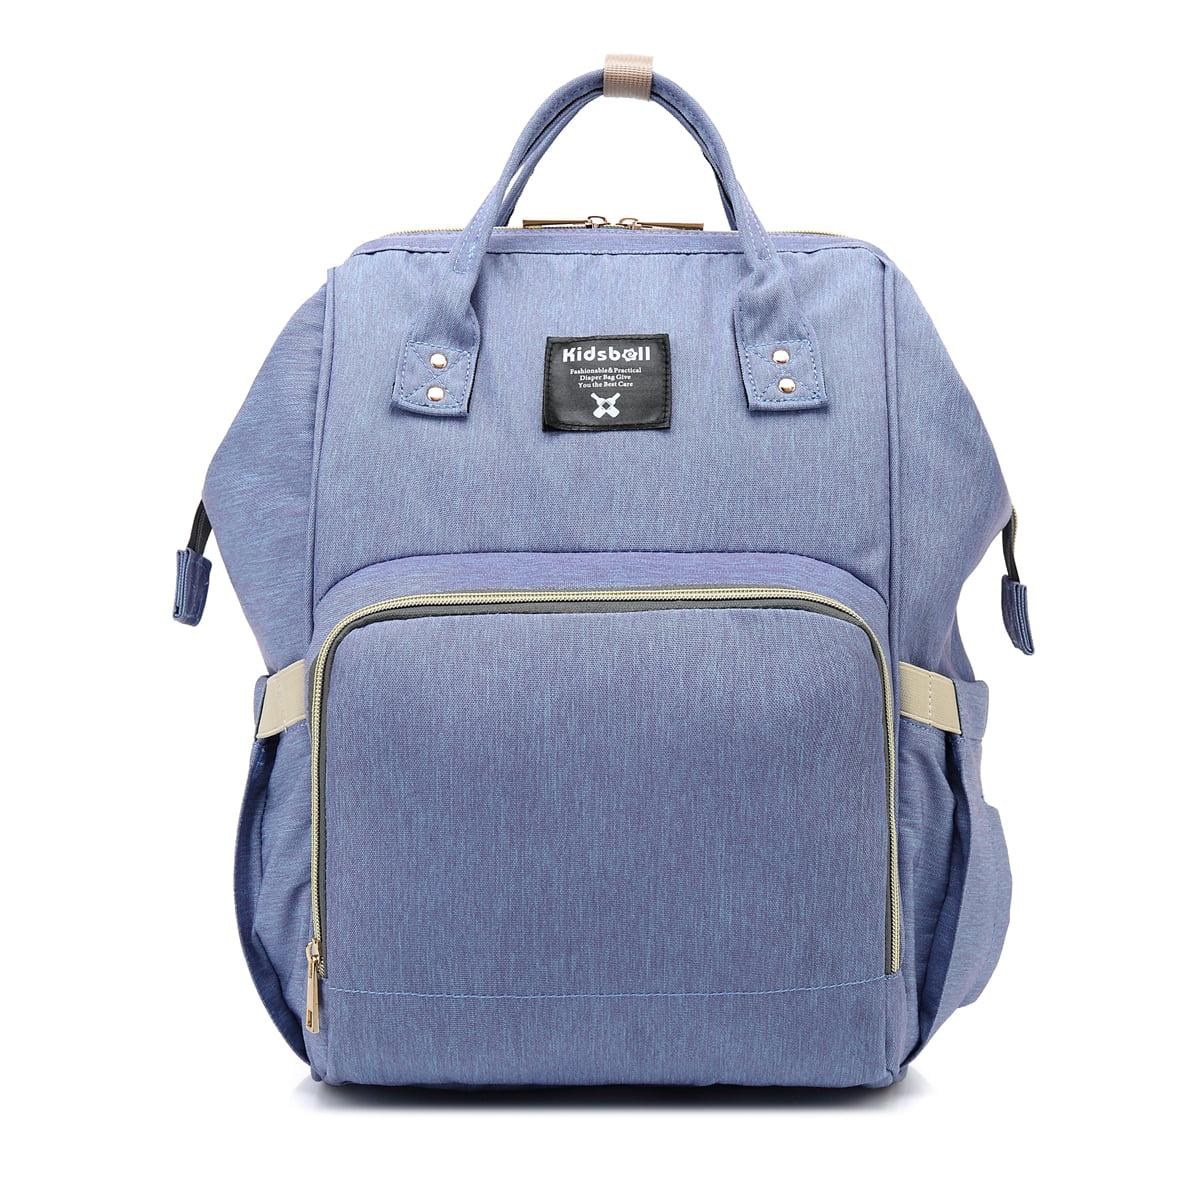 LUXUR High Capacity Diaper Bag Multi-Function Travel Backpack Nappy Bag Feeding Bottle Mother Shoulder Maternity Mummy Handbag